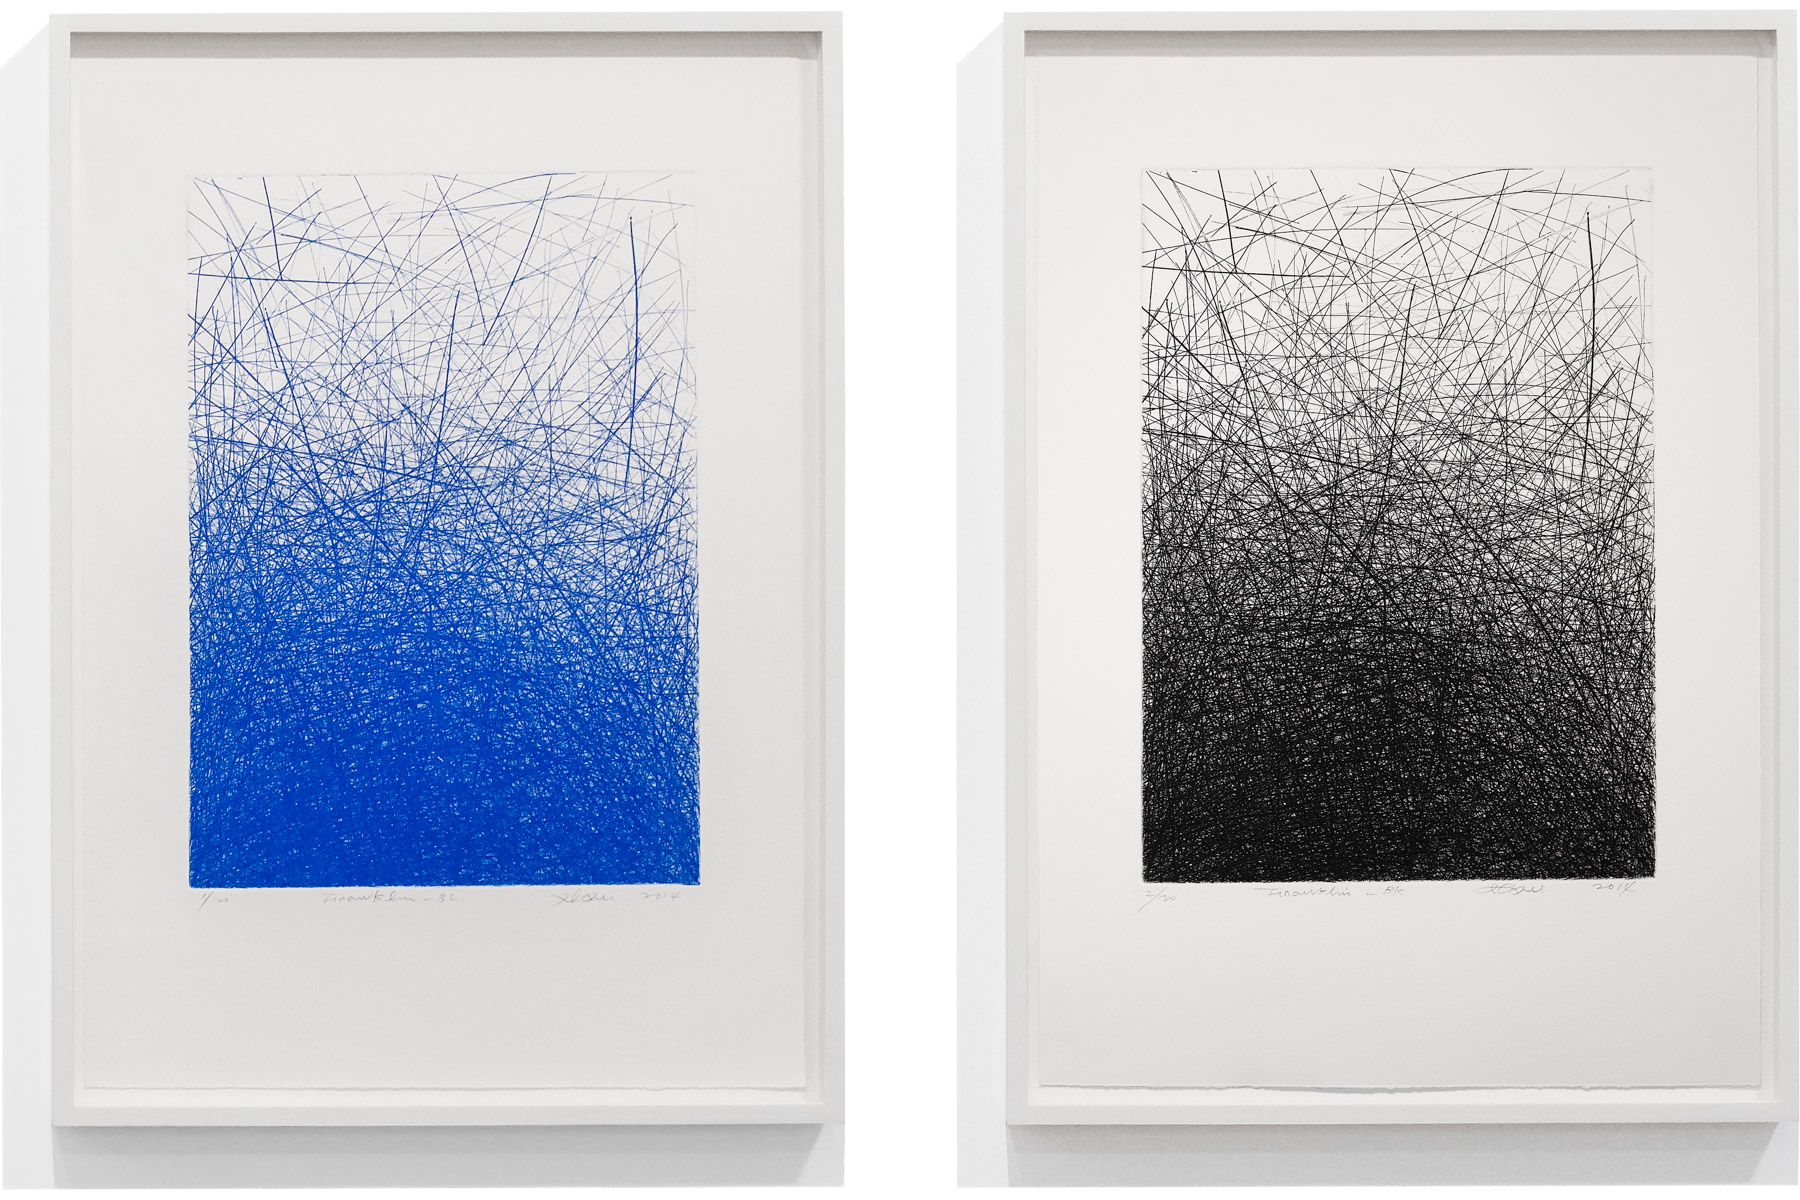 IL LEE,Franklin-BLandFranklin-BK, 2014, etching on paper